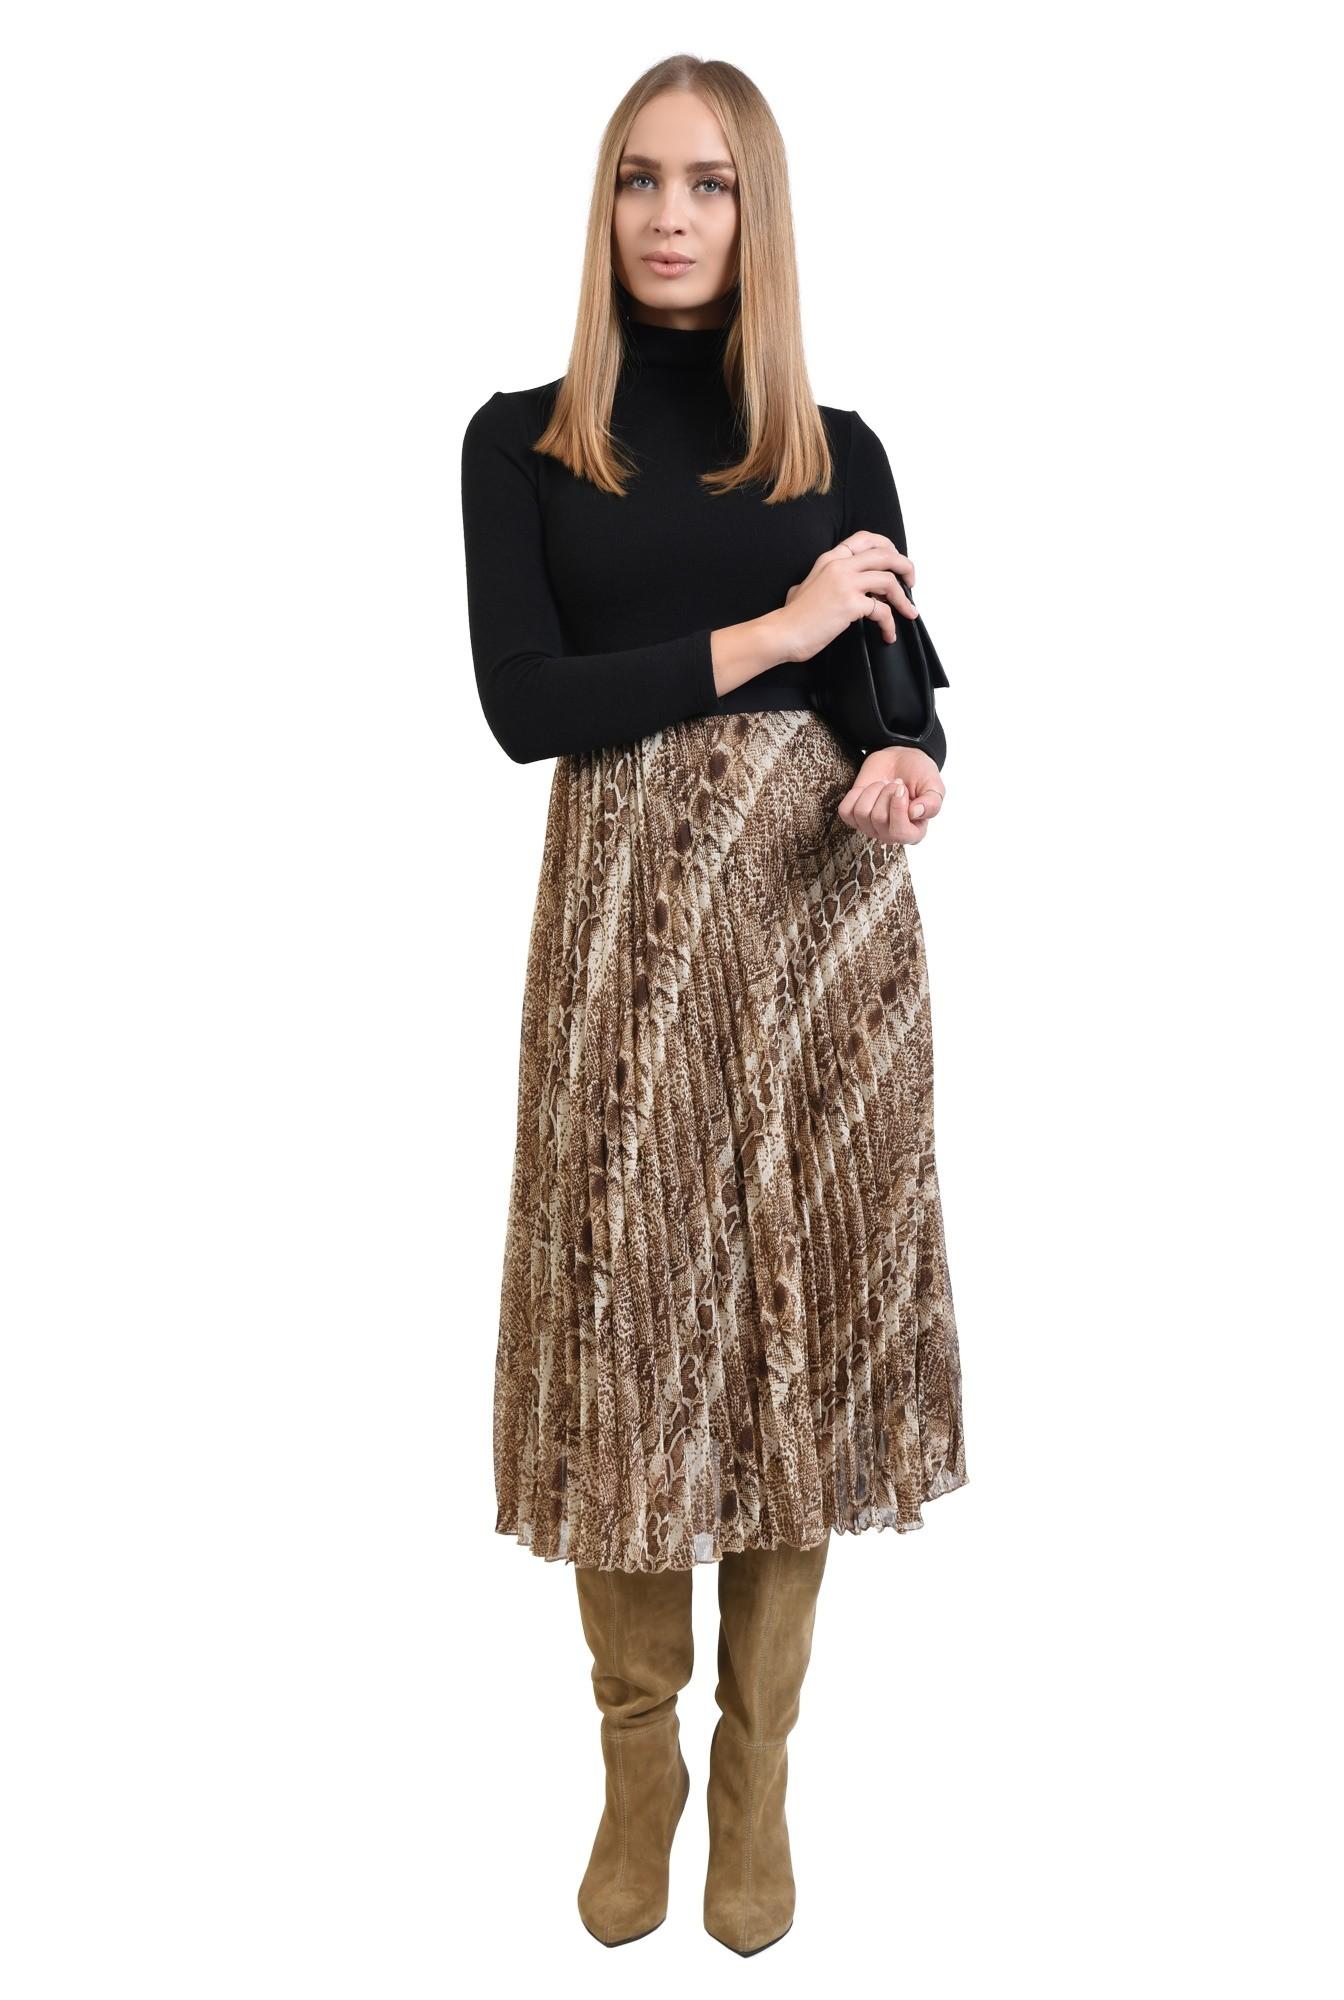 fusta animal print, din voal, pliseuri, talie inalta cu betelie elastica, print